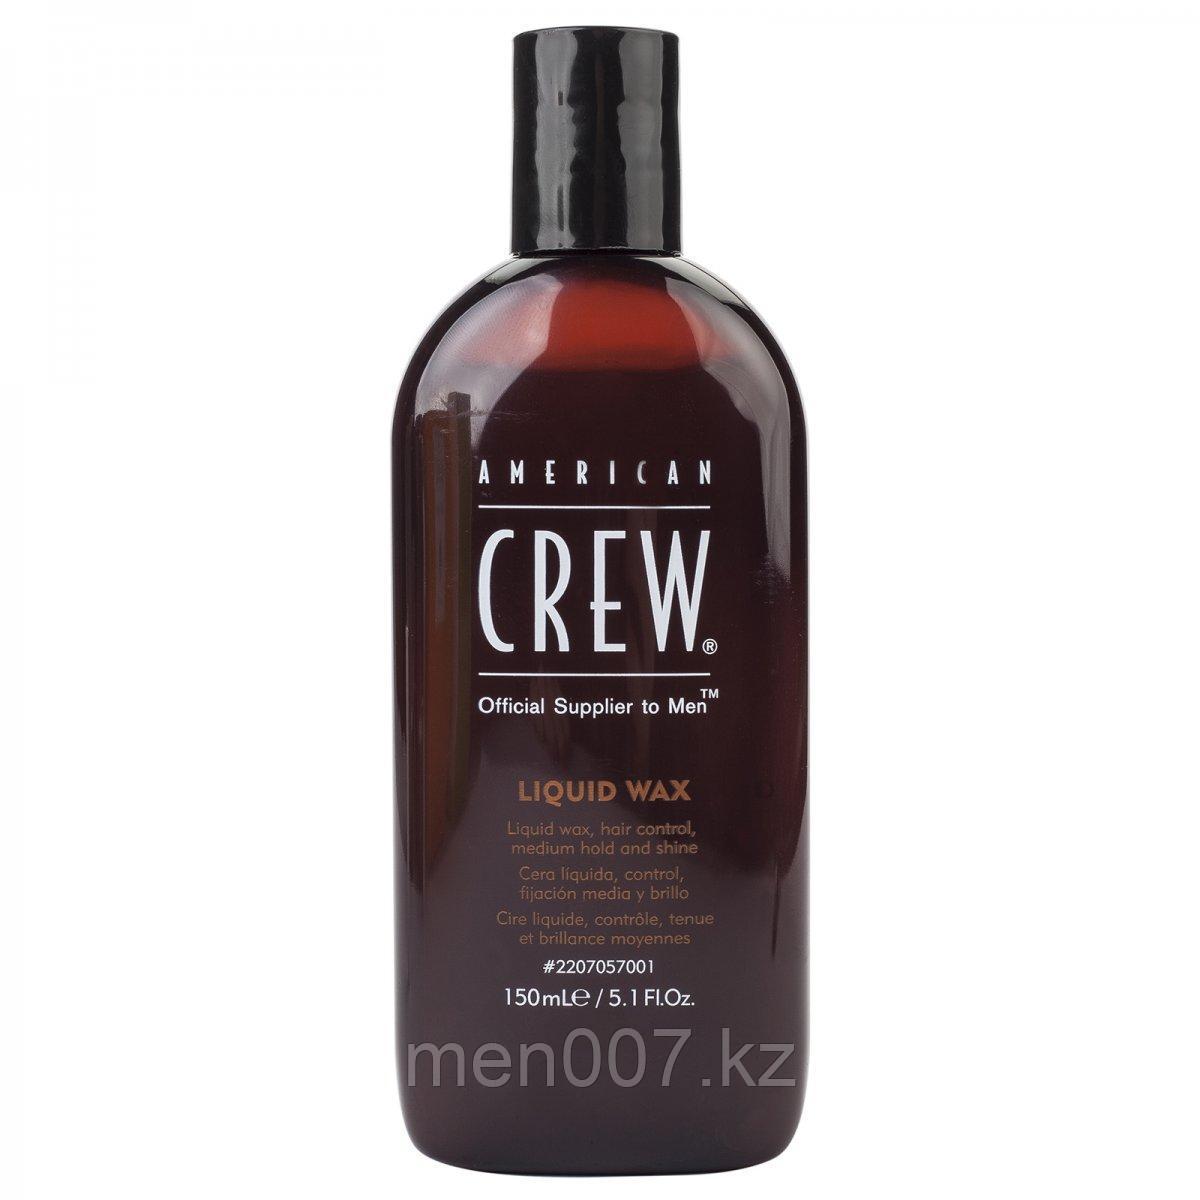 American Crew Liquid Wax (Жидкий воск) 150 мл